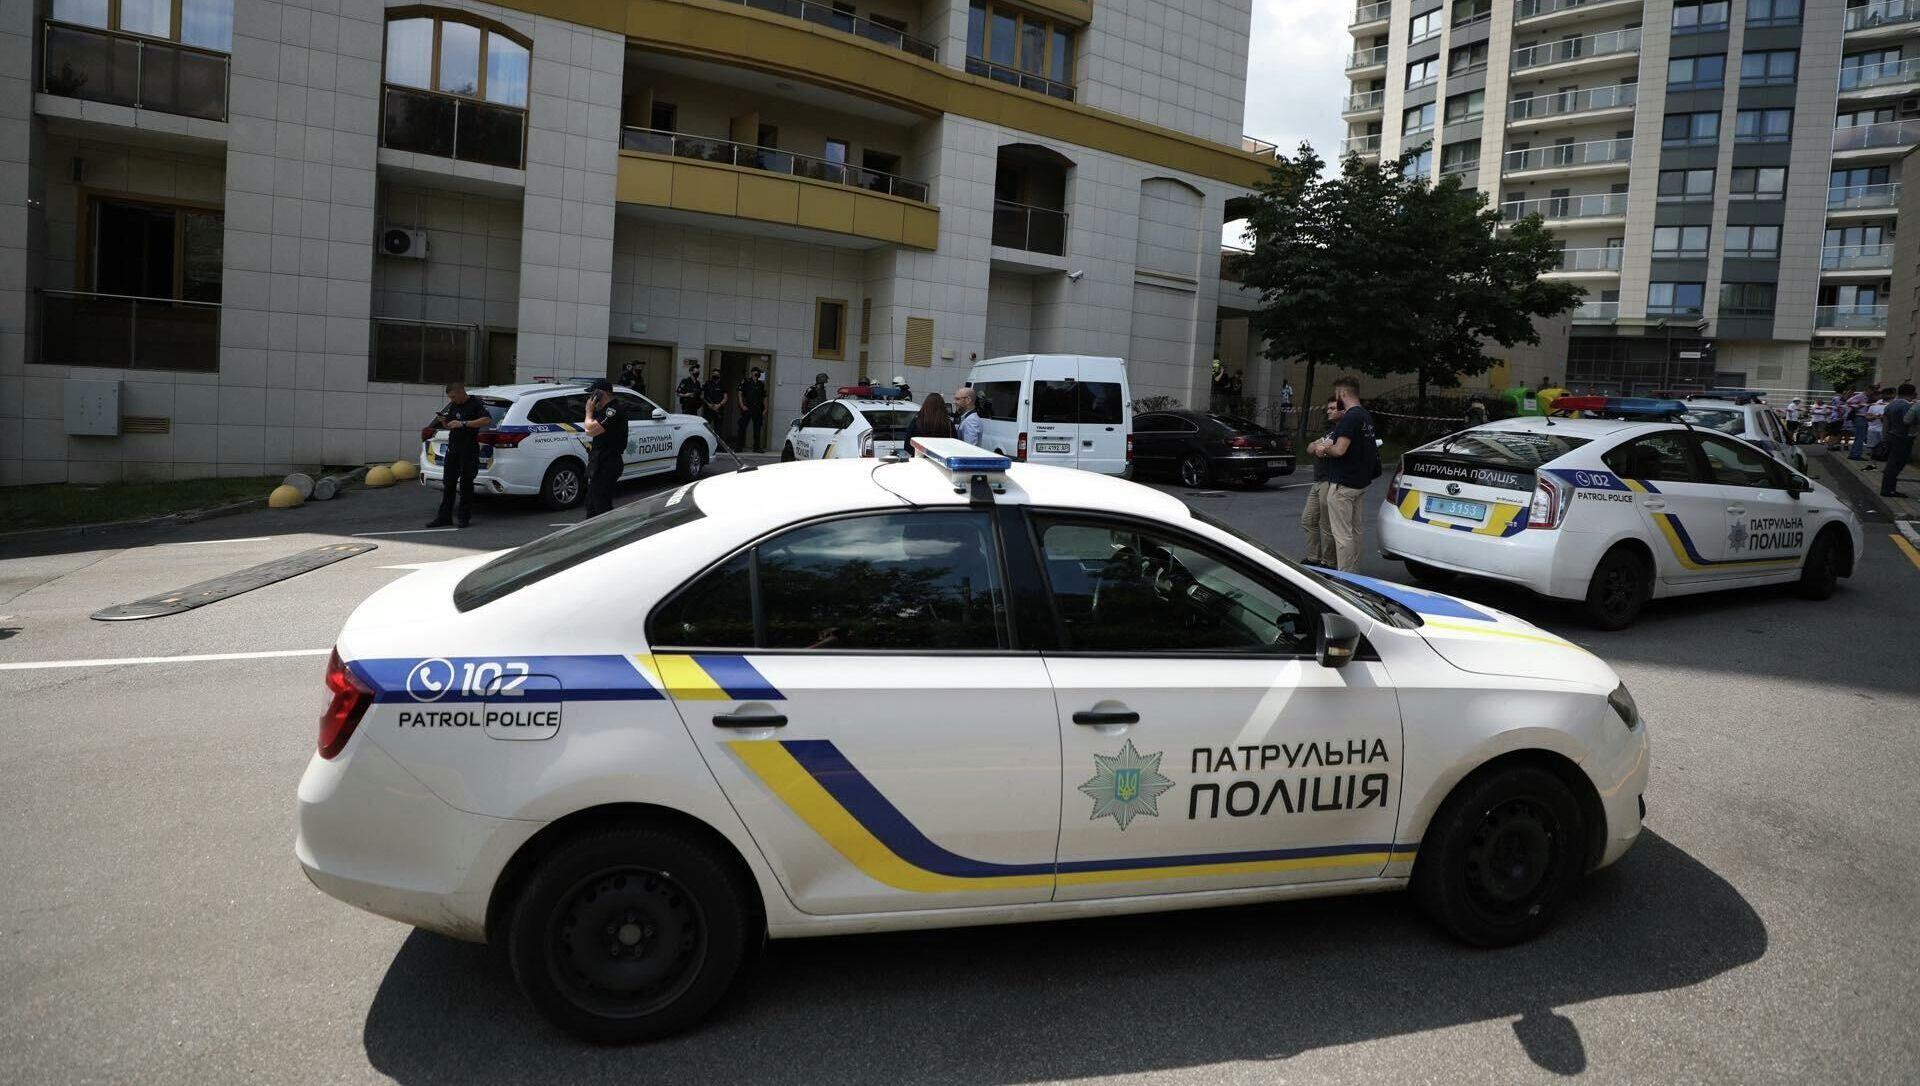 Cảnh sát Ukraina tại Kiev - Sputnik Việt Nam, 1920, 22.09.2021